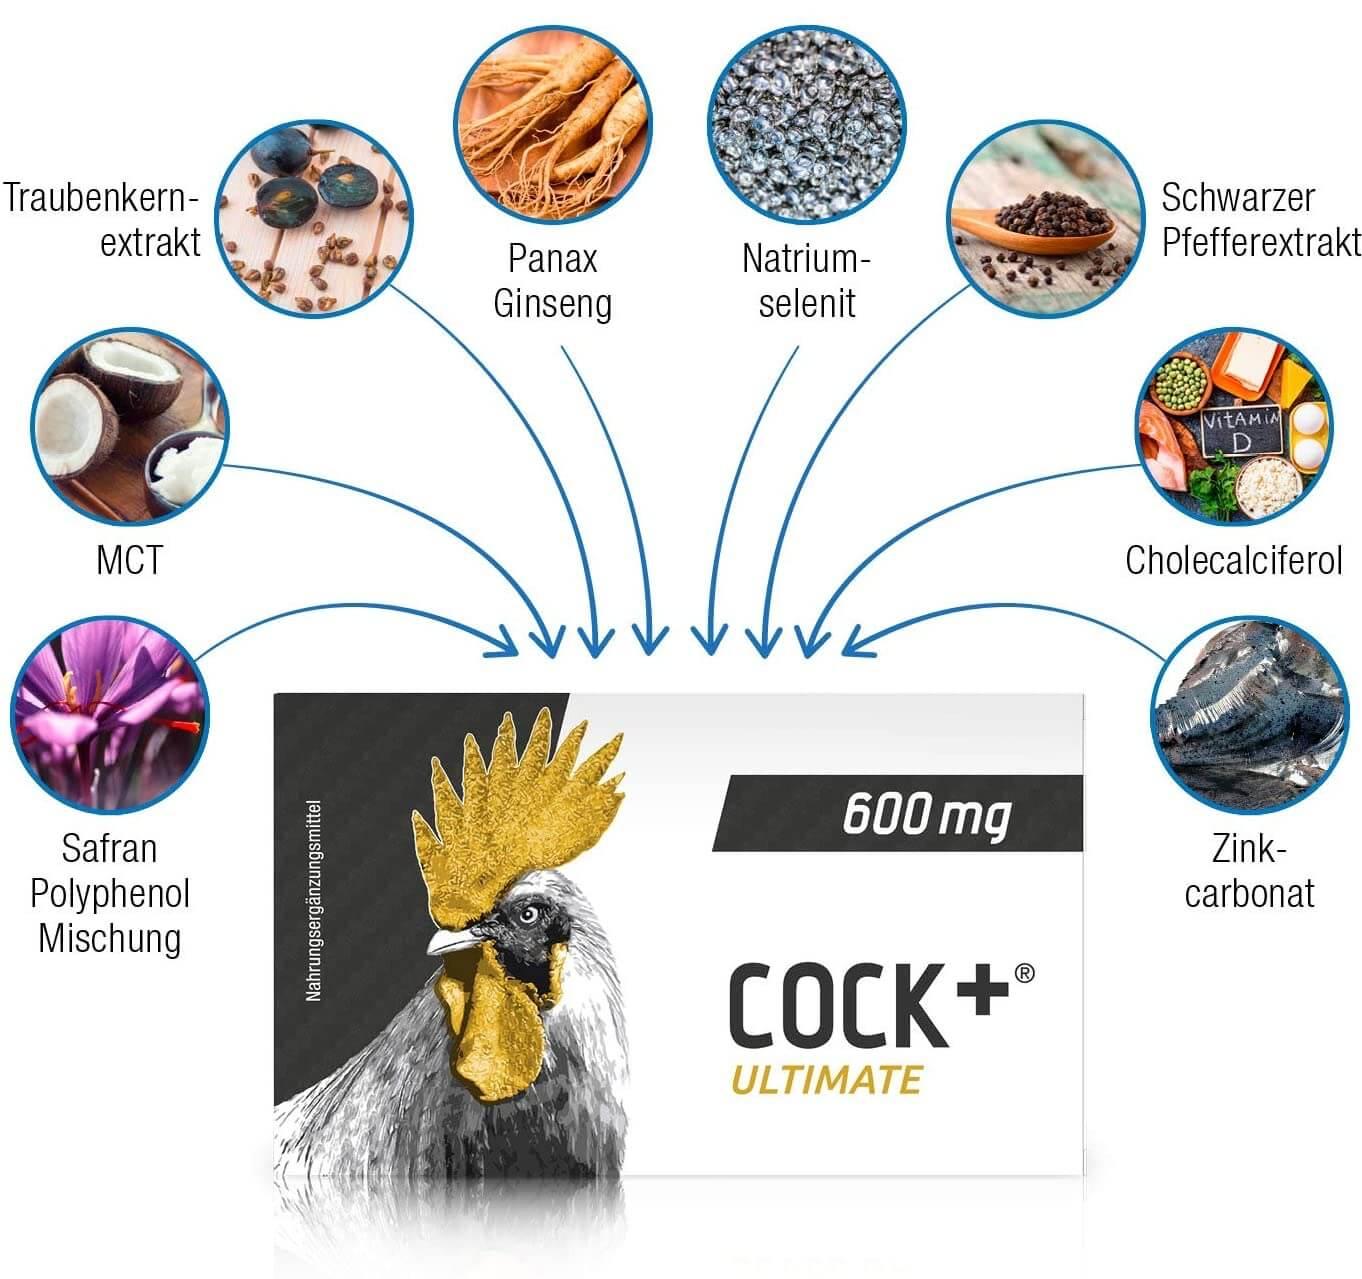 Cockplus Inhaltsstoffe